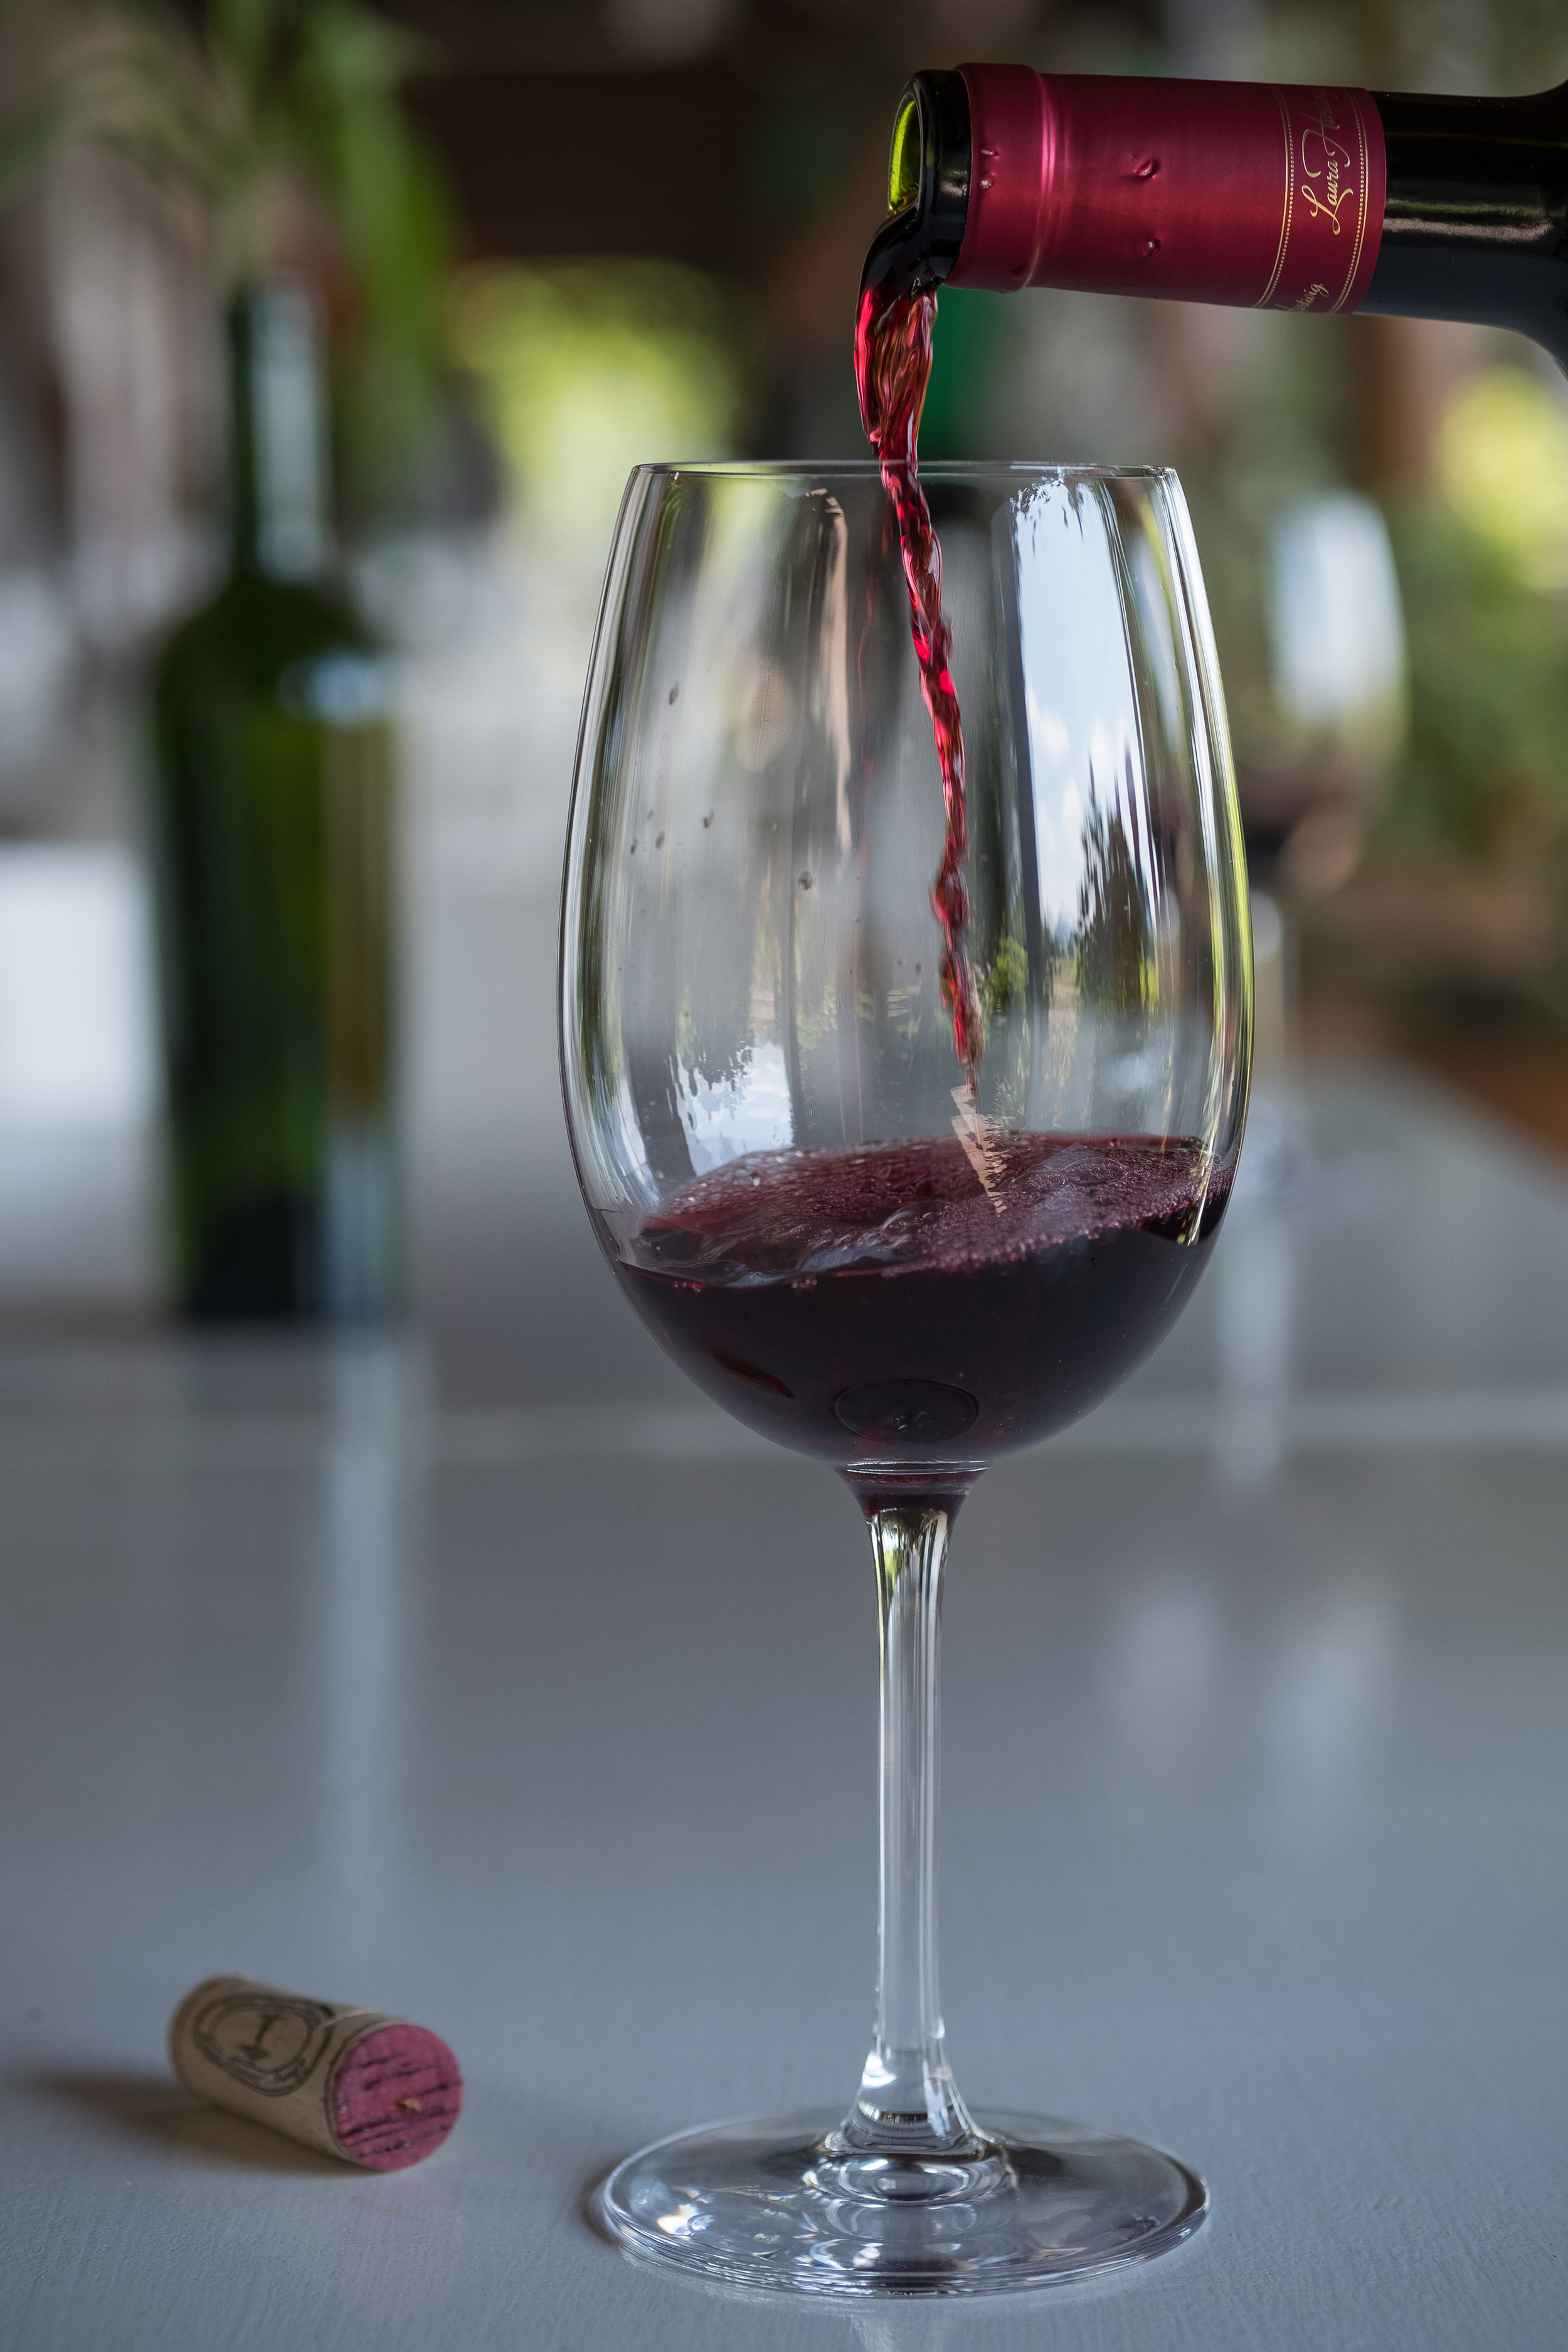 Laura Hartwig Wine Pour 2 LI Dimens.jpg